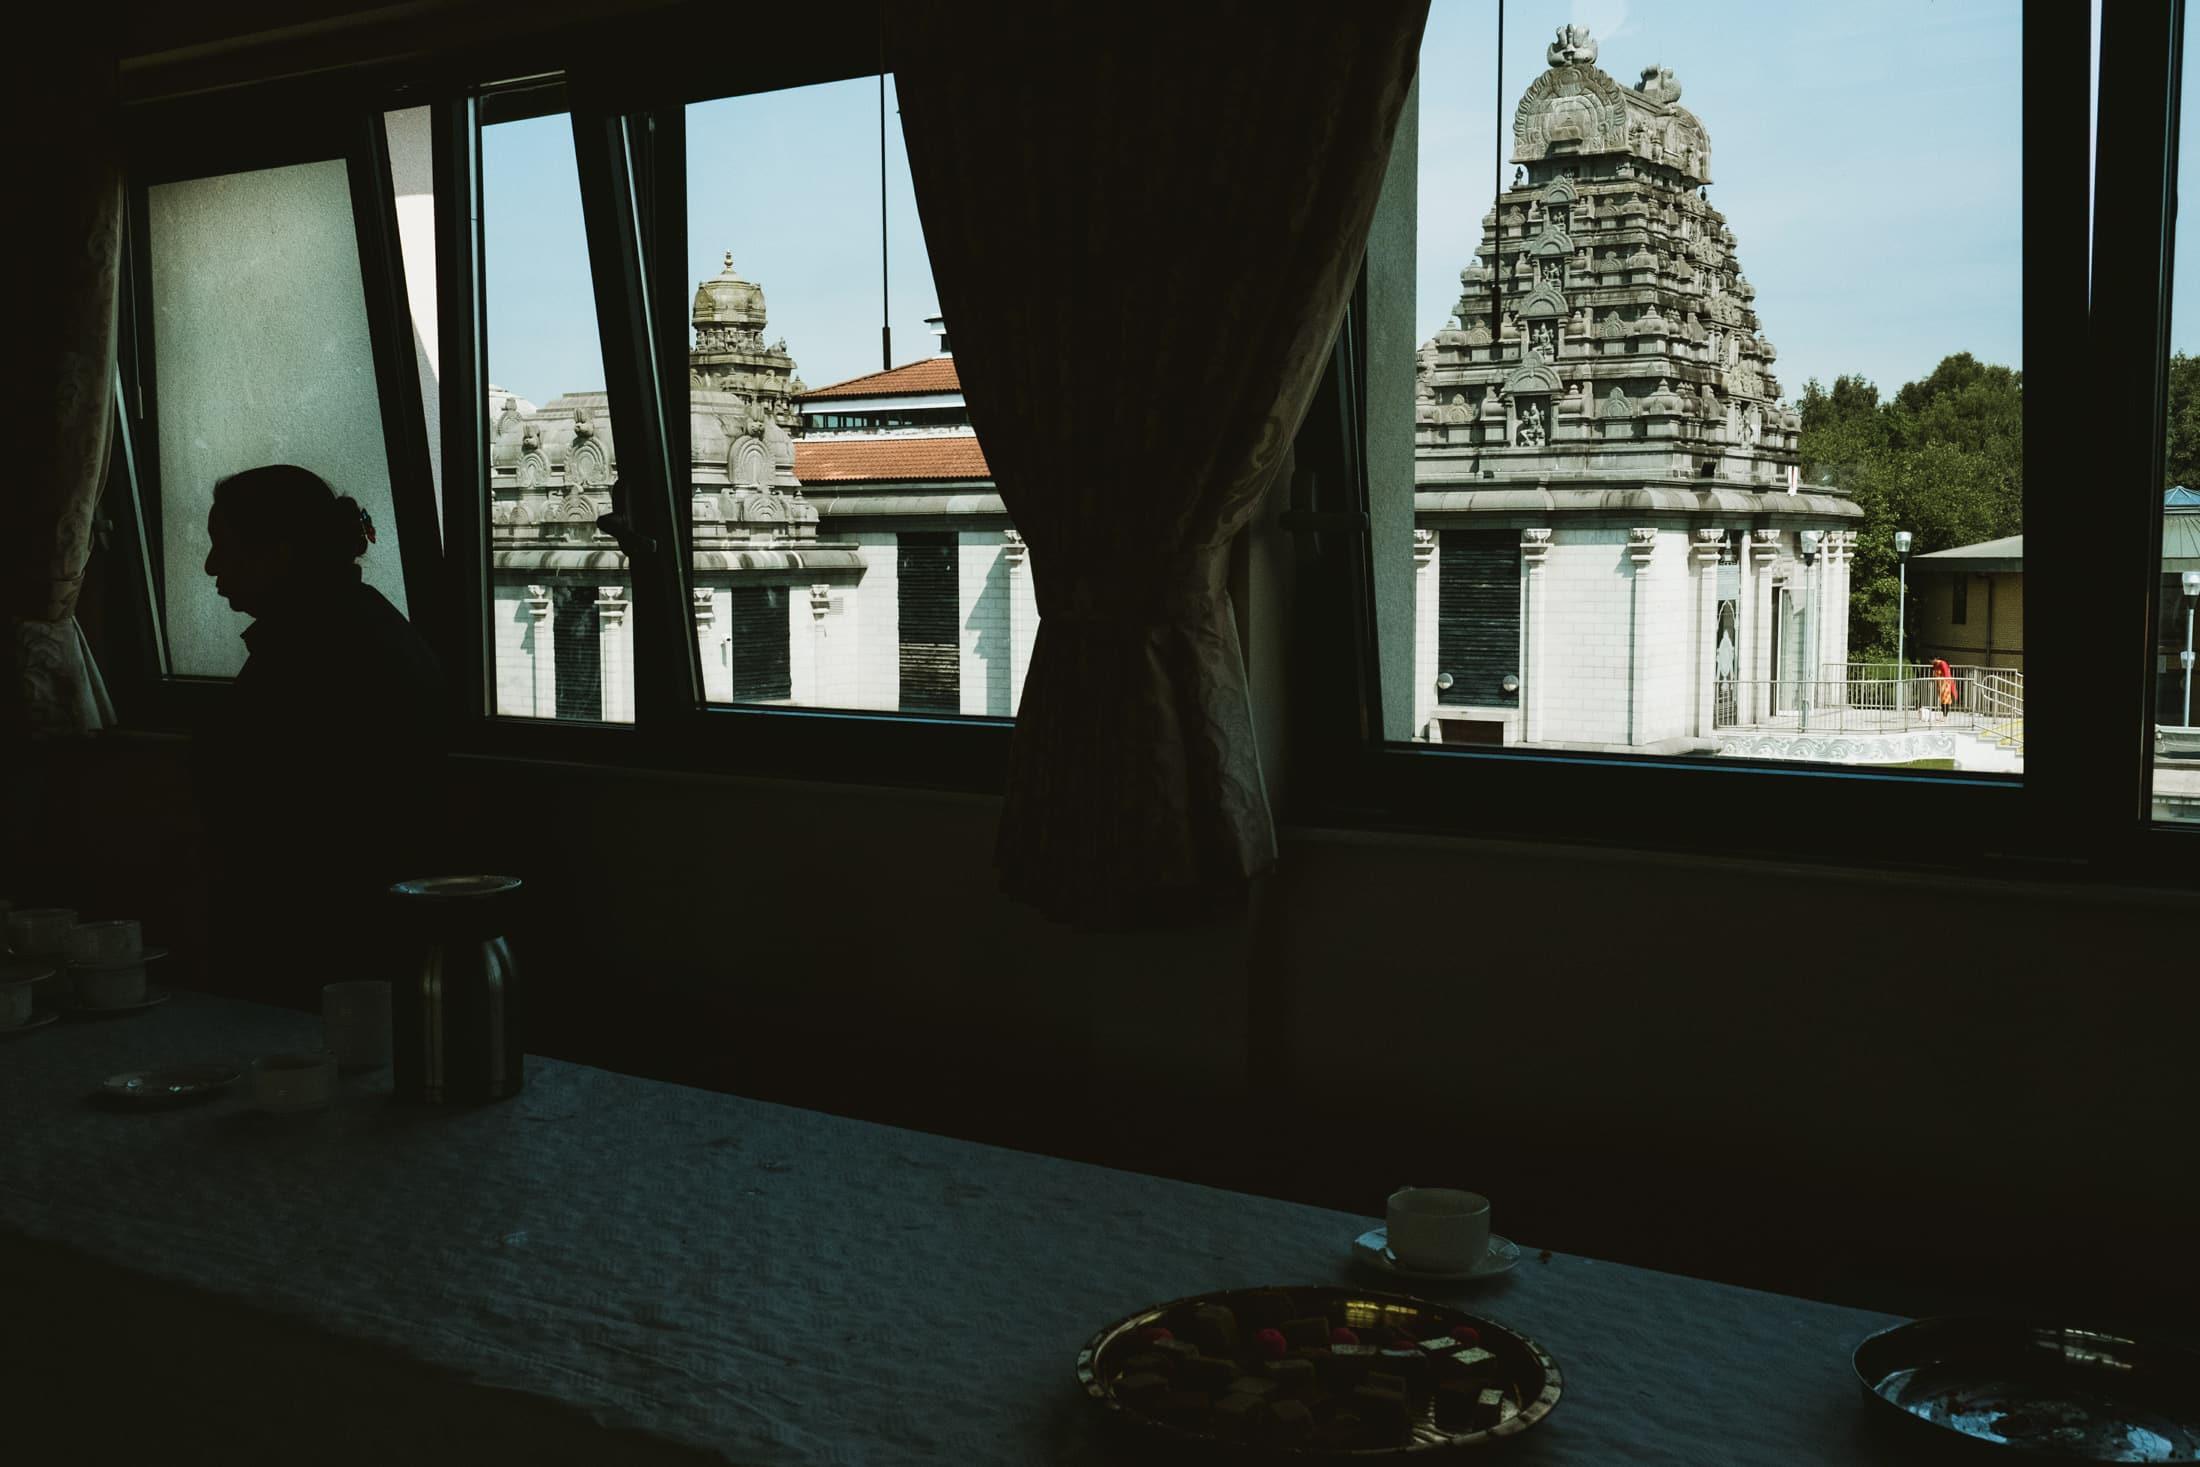 silhouette with Shri Venkateswara Balaji Temple